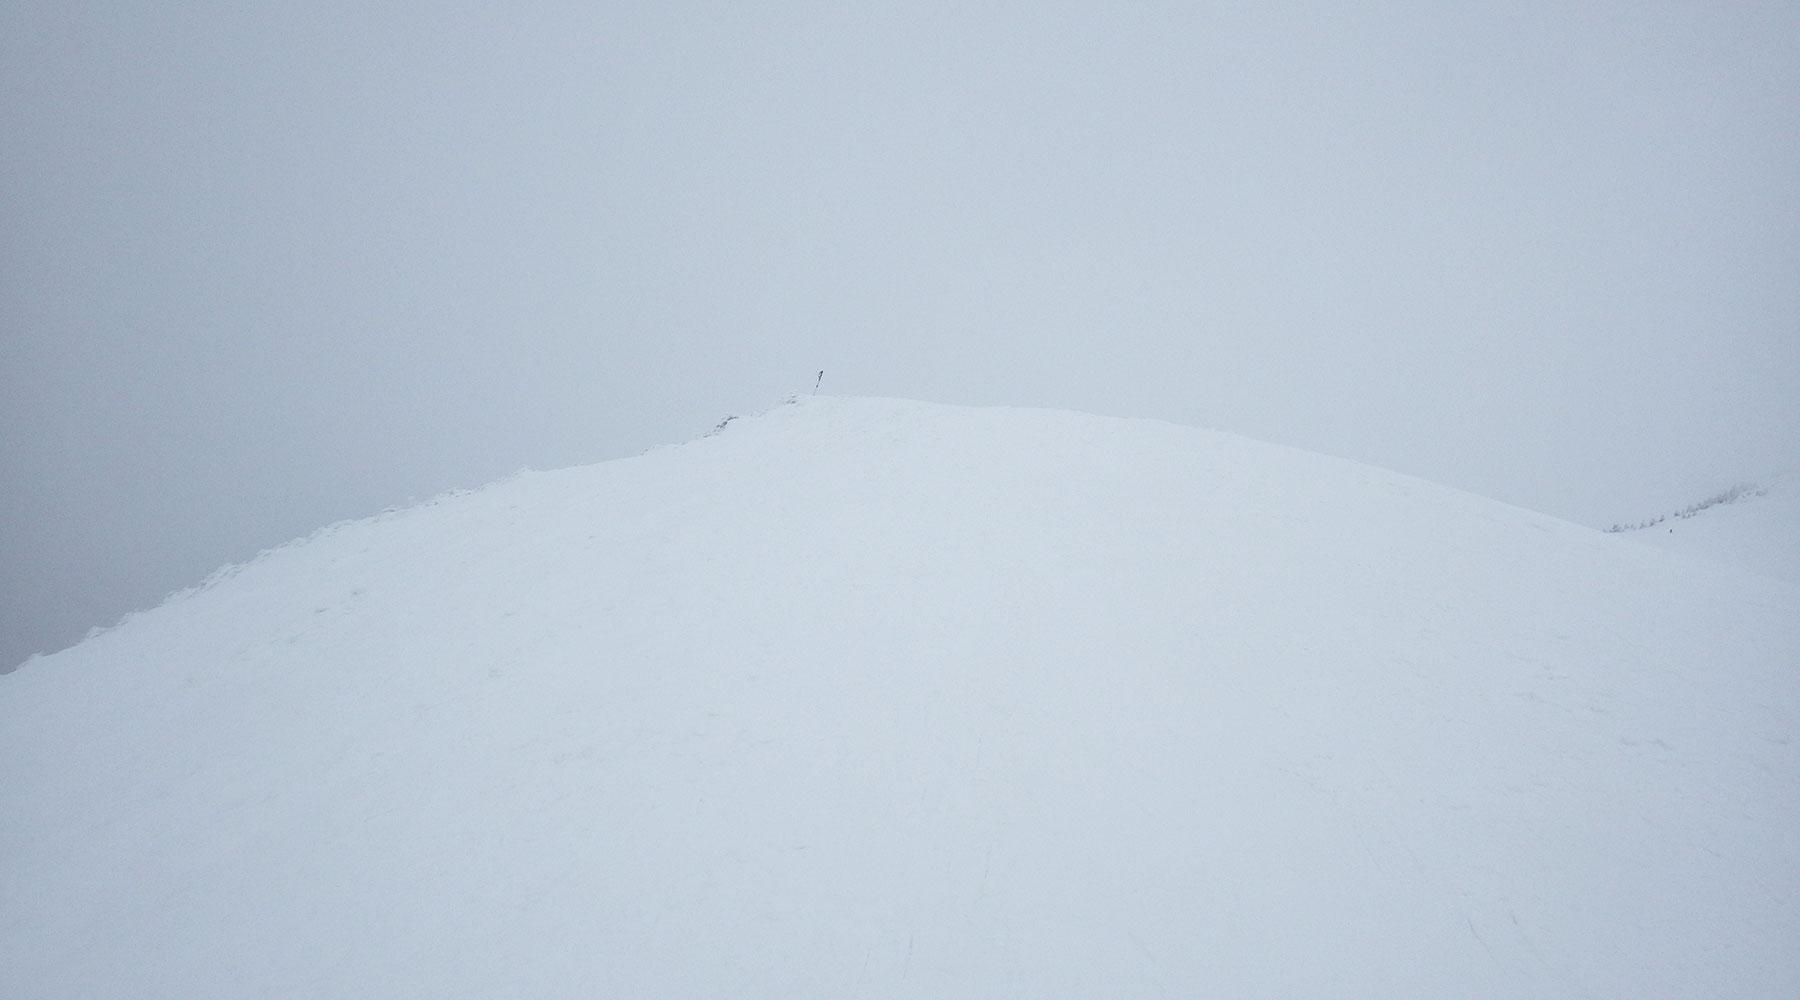 ニセ巻機山山頂手前